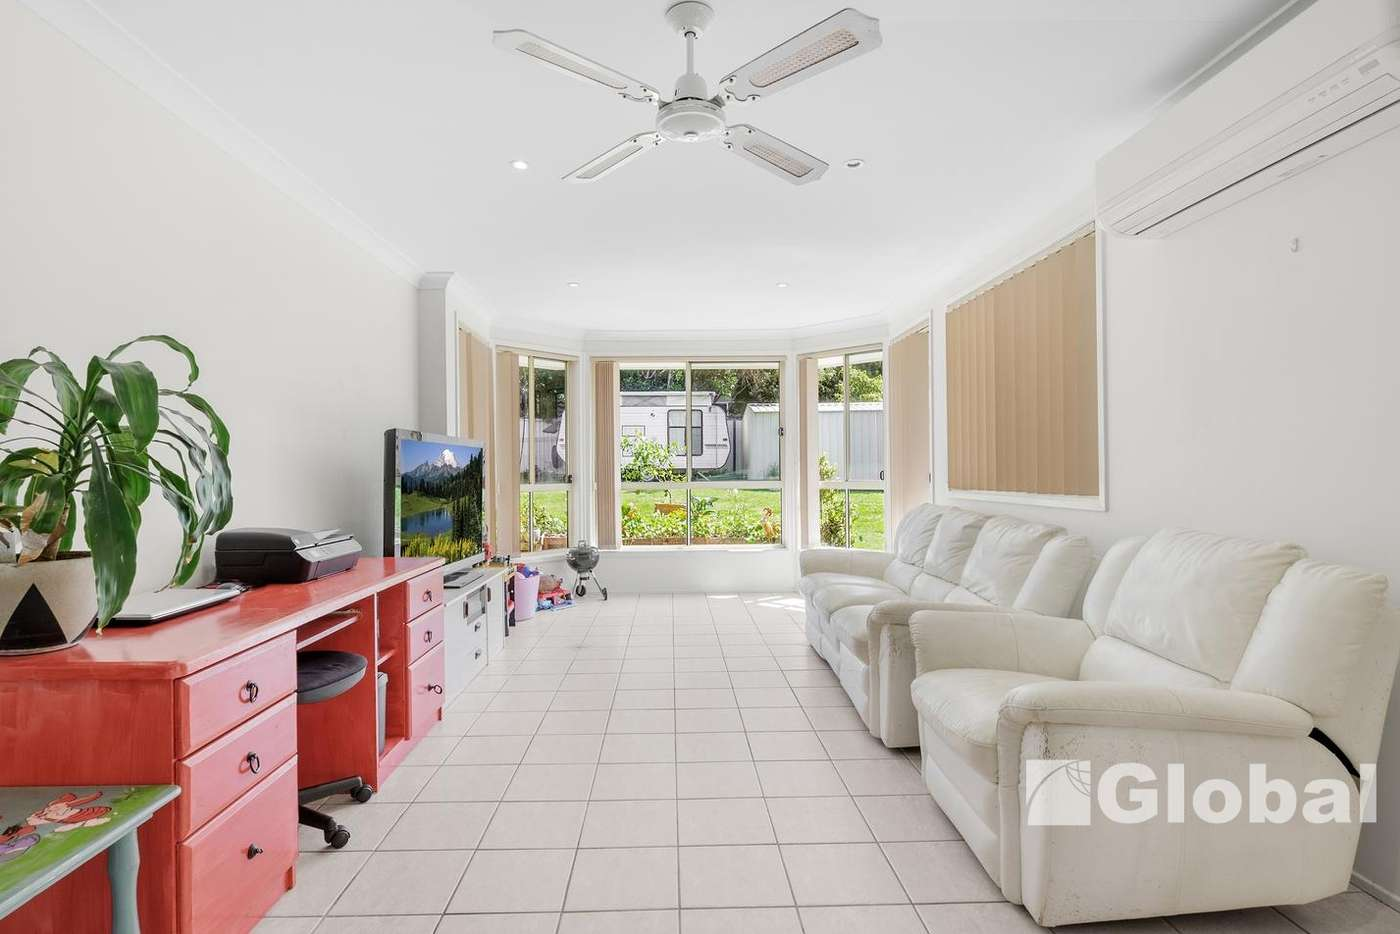 Sixth view of Homely house listing, 80 Huene Avenue, Halekulani NSW 2262